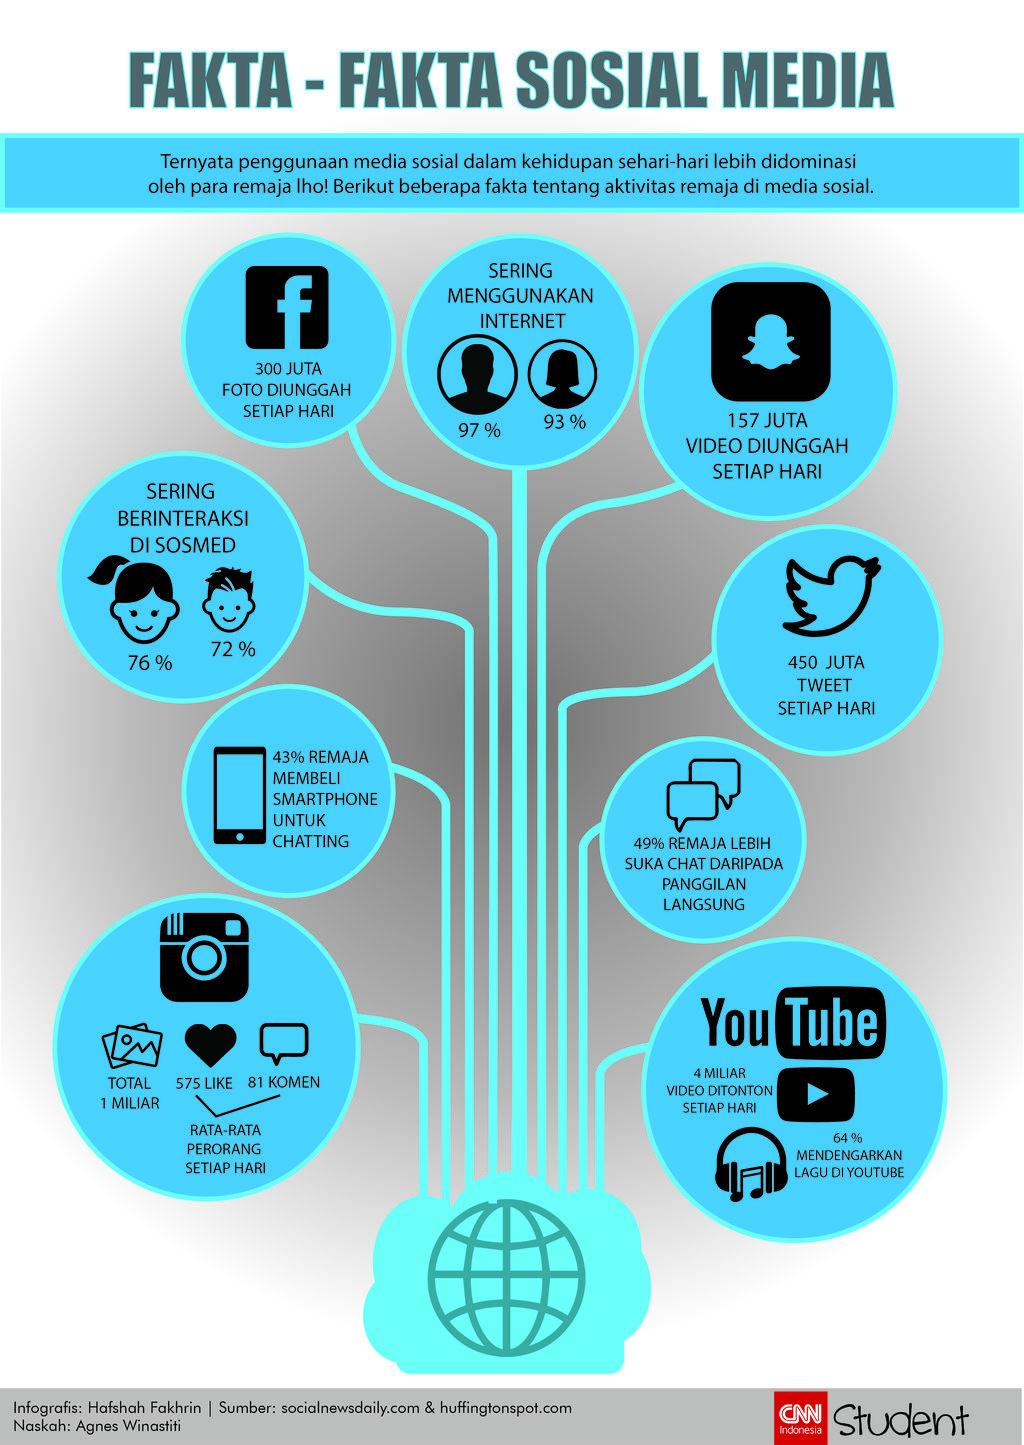 Infografis remaja dan media sosial (CNN Indonesia/Hafshah Fakhrin)